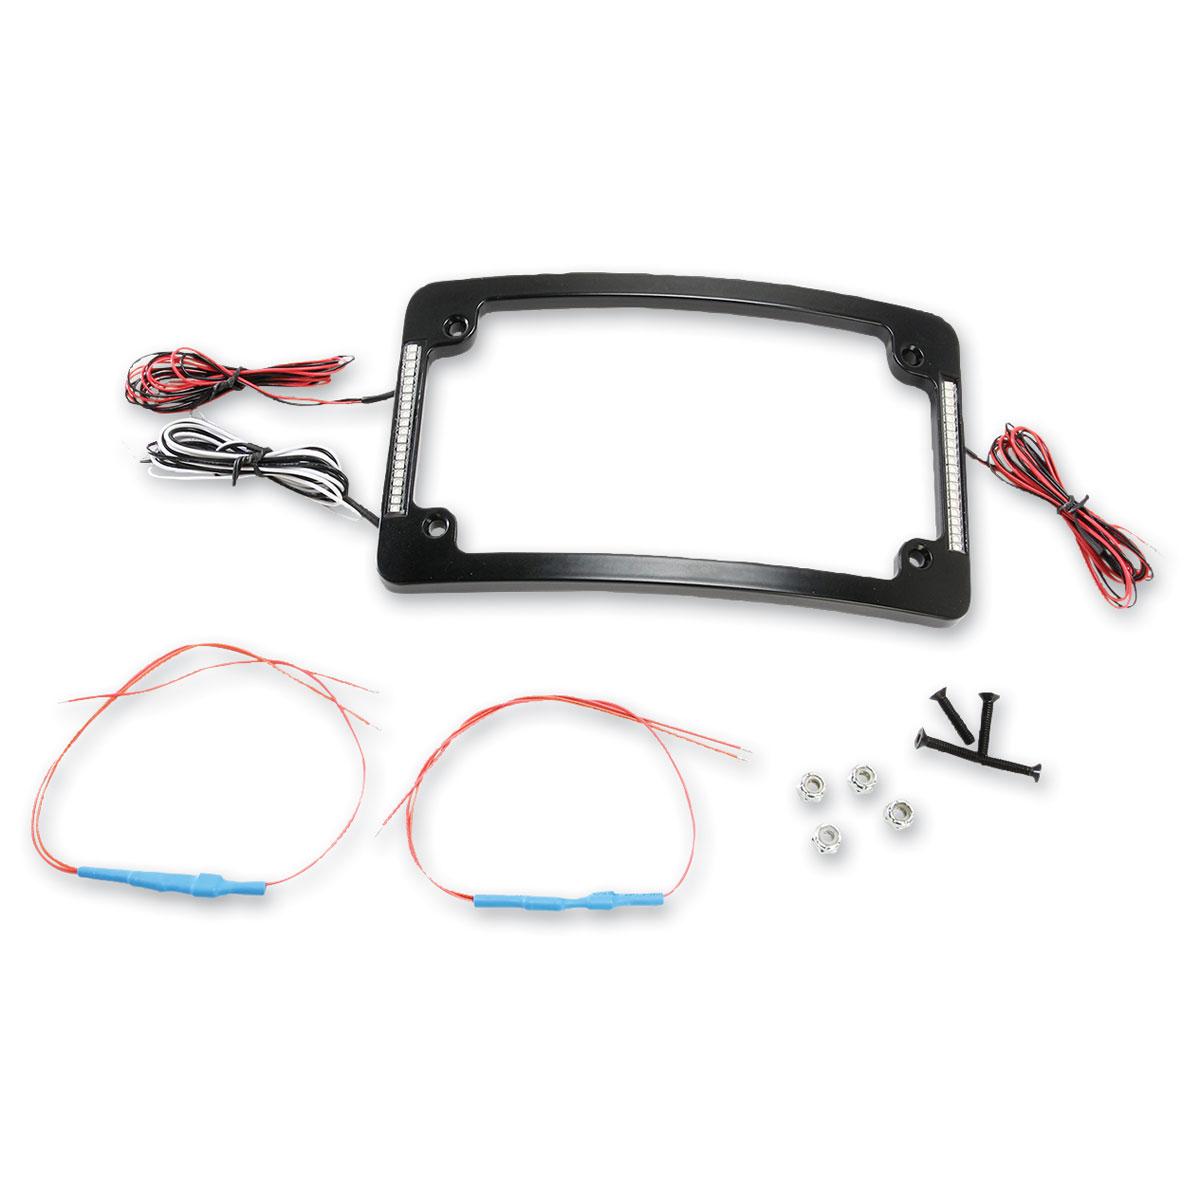 Custom Dynamics Black Tri-Radius All-In-One LED License Plate Frame ...